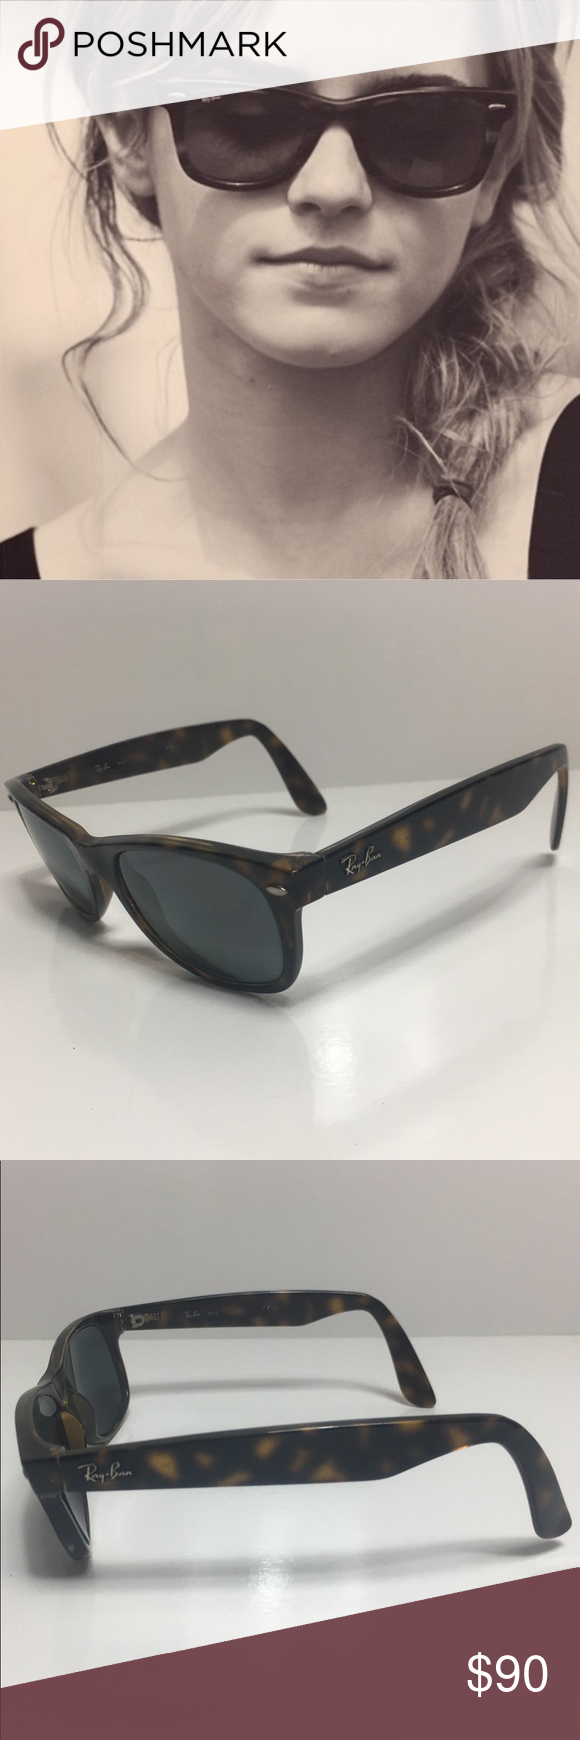 58afc075bd Ray-Ban New Wayfarer Havana Sunglasses 🇮🇹 Ray-Ban New Wayfarer Sunglasses Tortoise  RB2132 902 52-18 The New Wayfarer RB2132 902 52-18 is a modern and ...